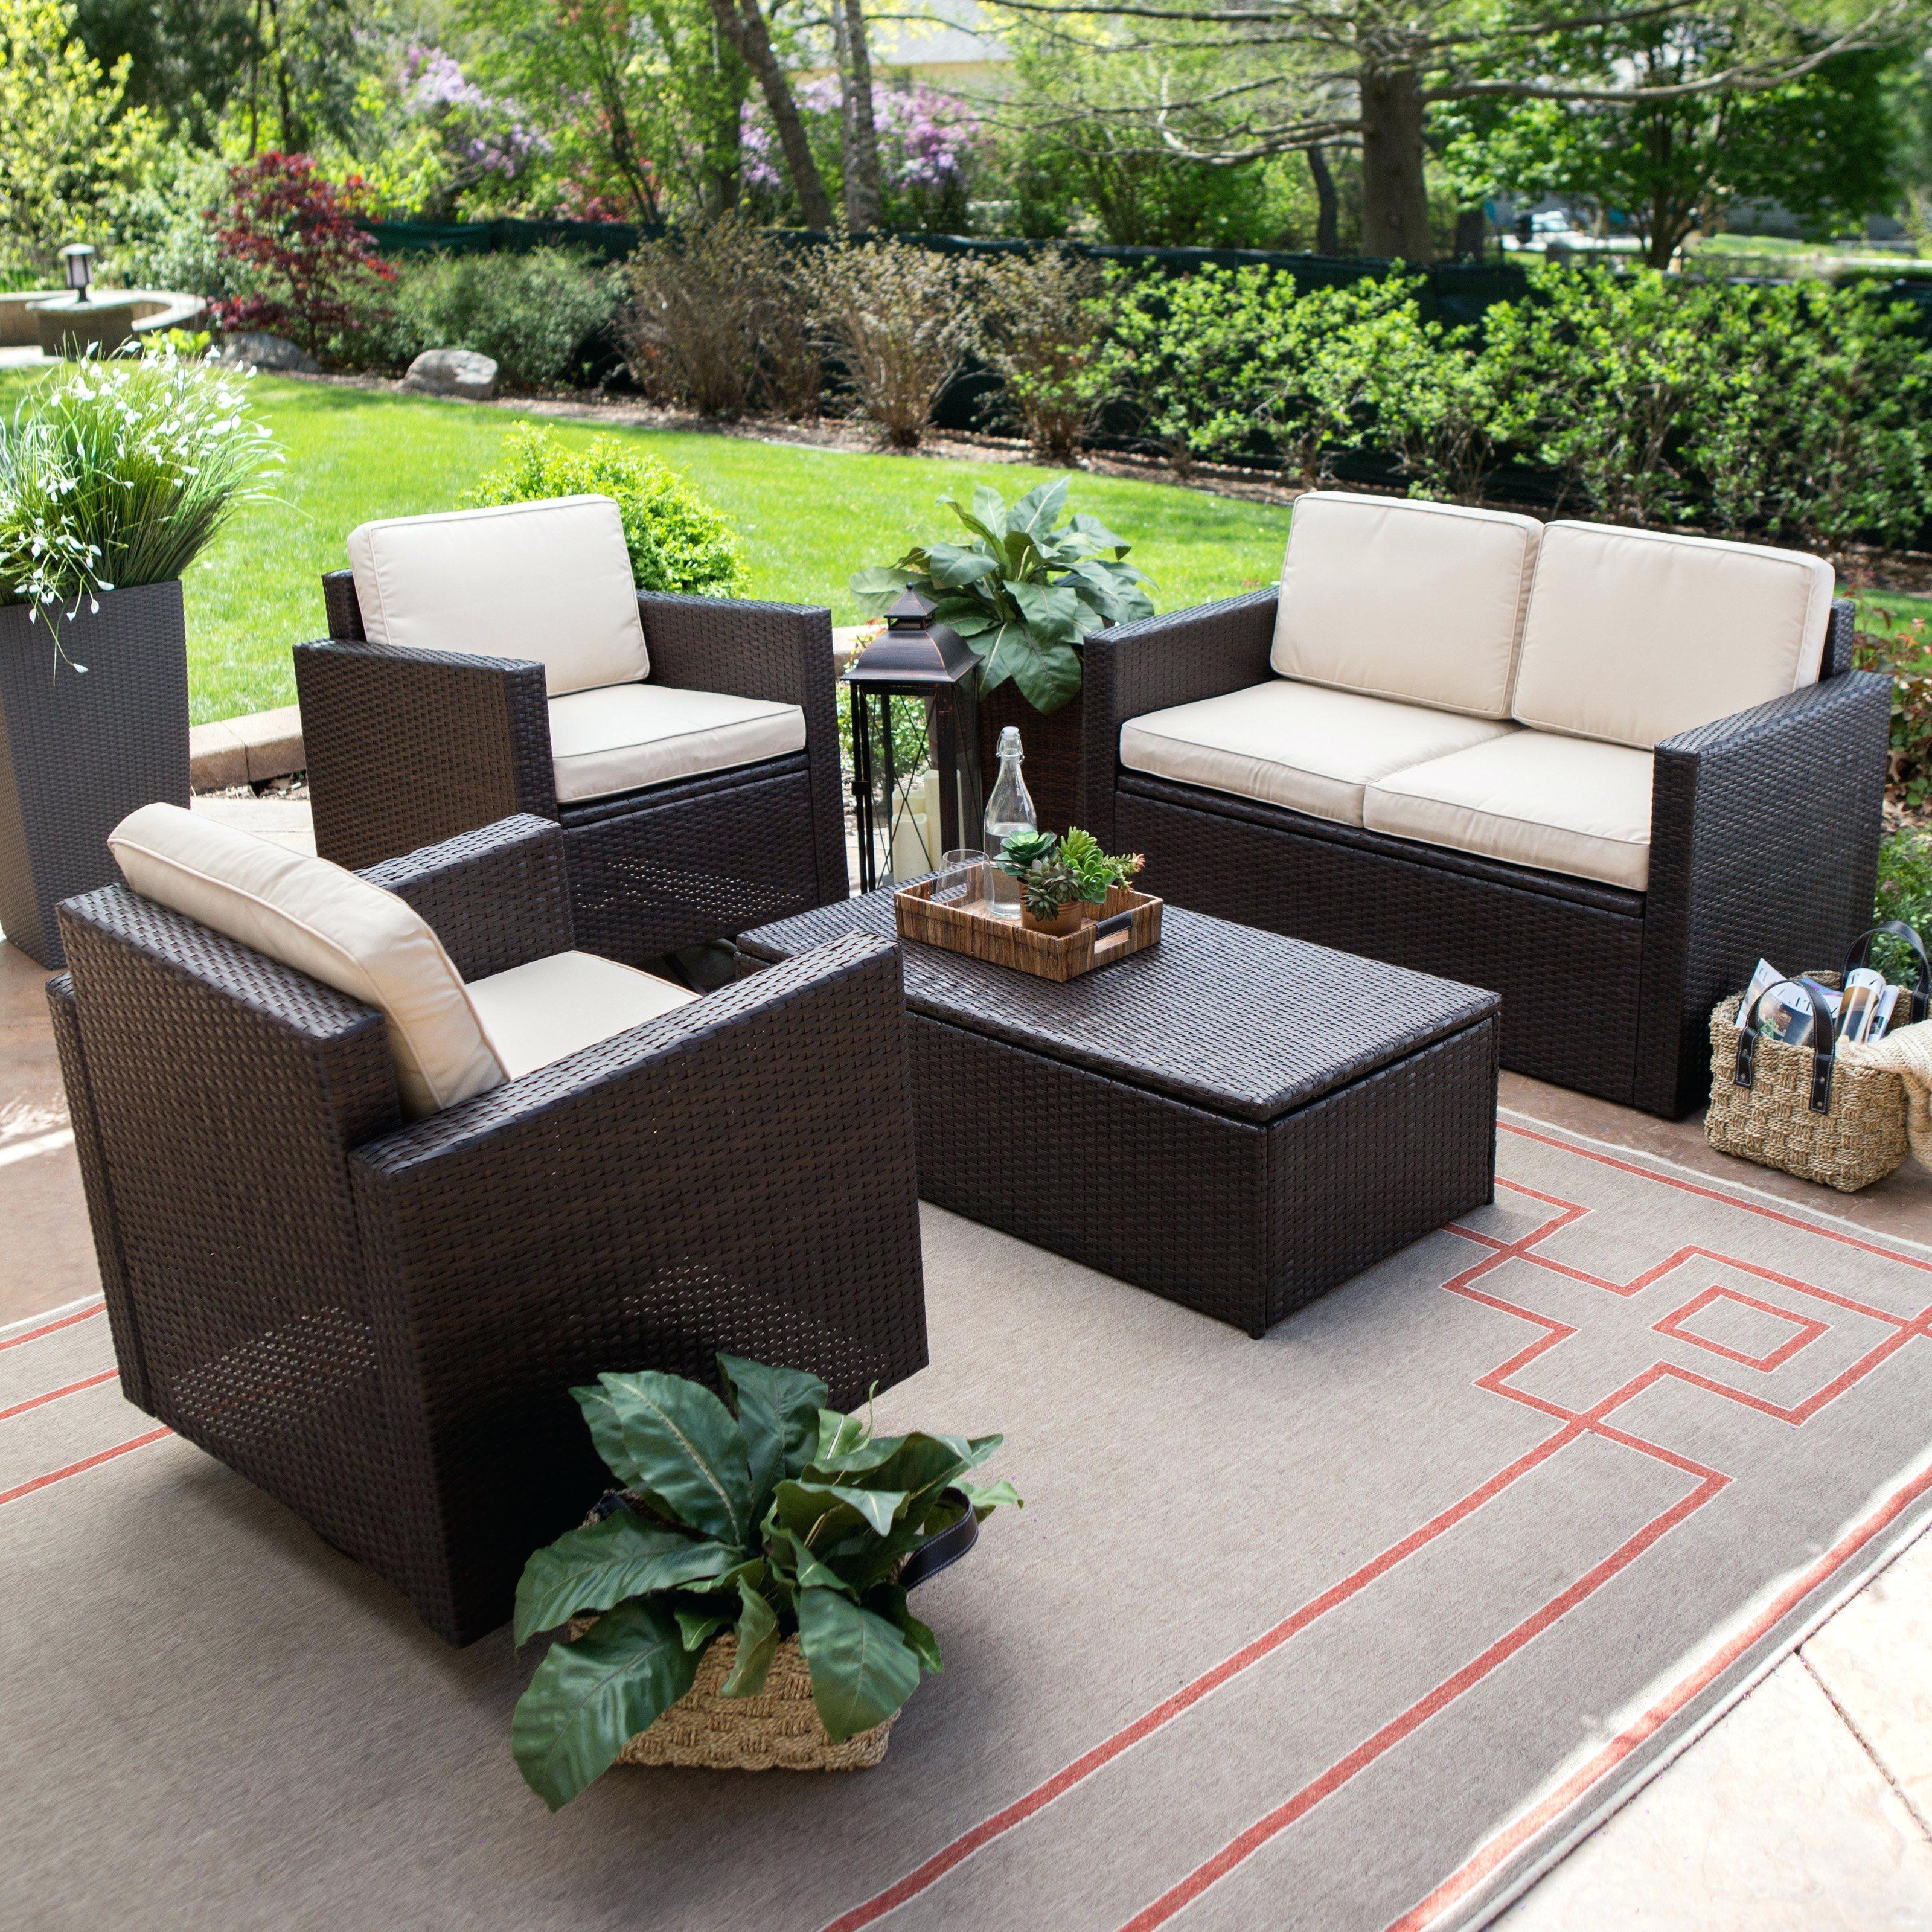 Favorite Patio Conversation Sets Coral Coast Wicker 4 Piece Conversation Set Pertaining To Outdoor Patio Furniture Conversation Sets (View 5 of 15)